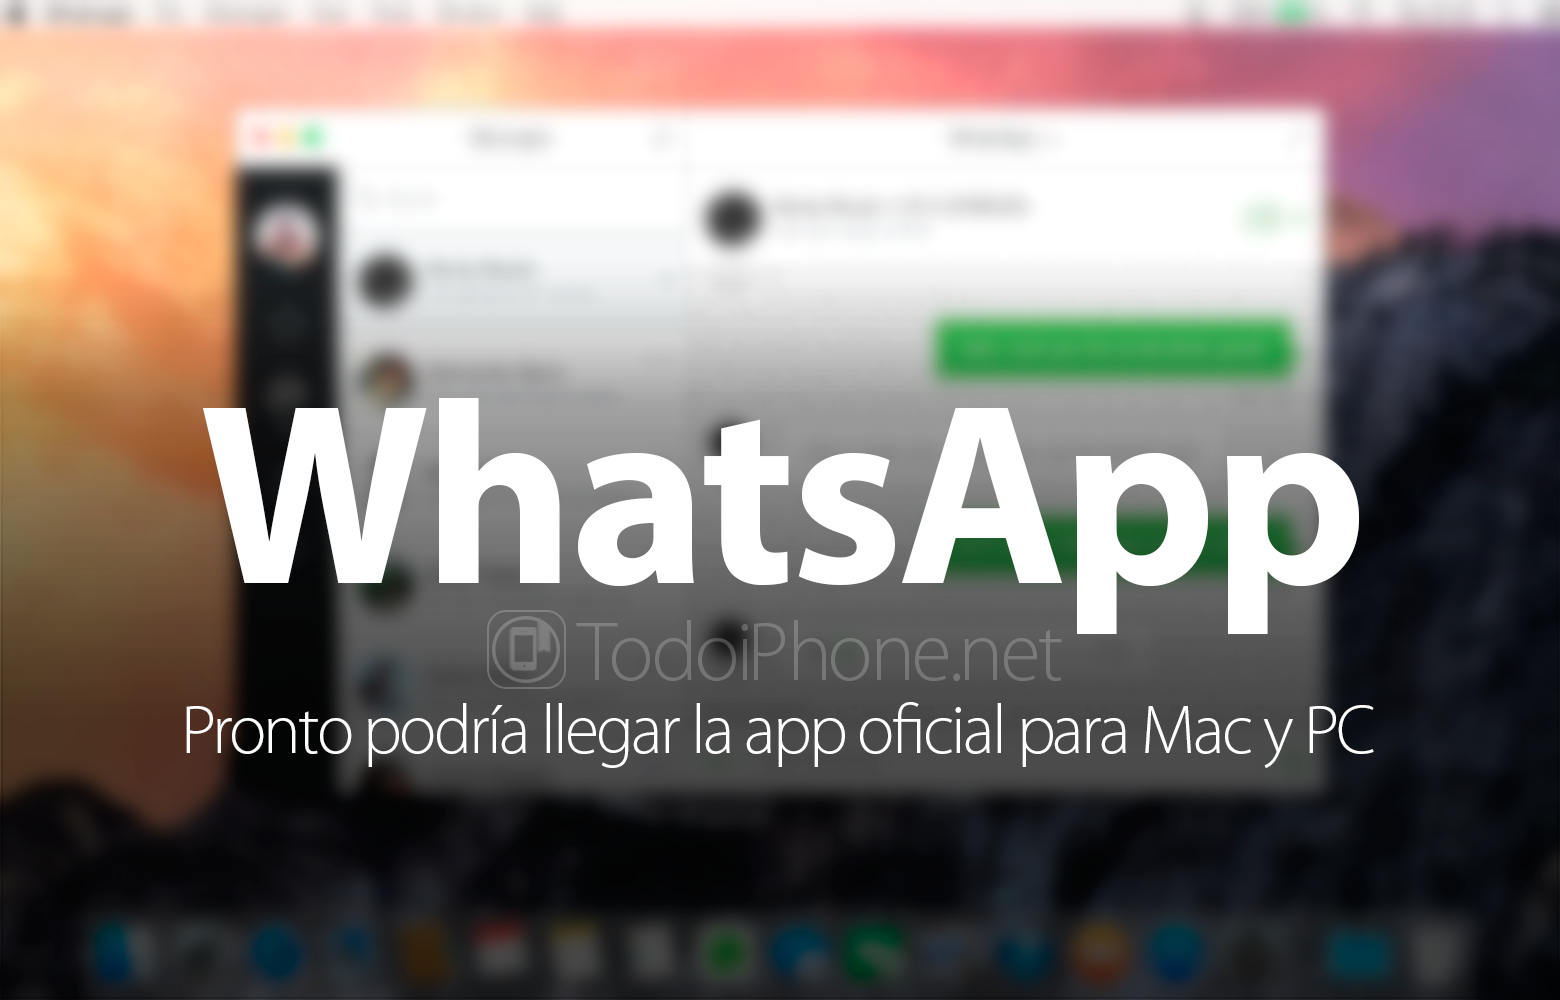 aplicacion-whatsapp-mac-pc-podria-llegar-pronto